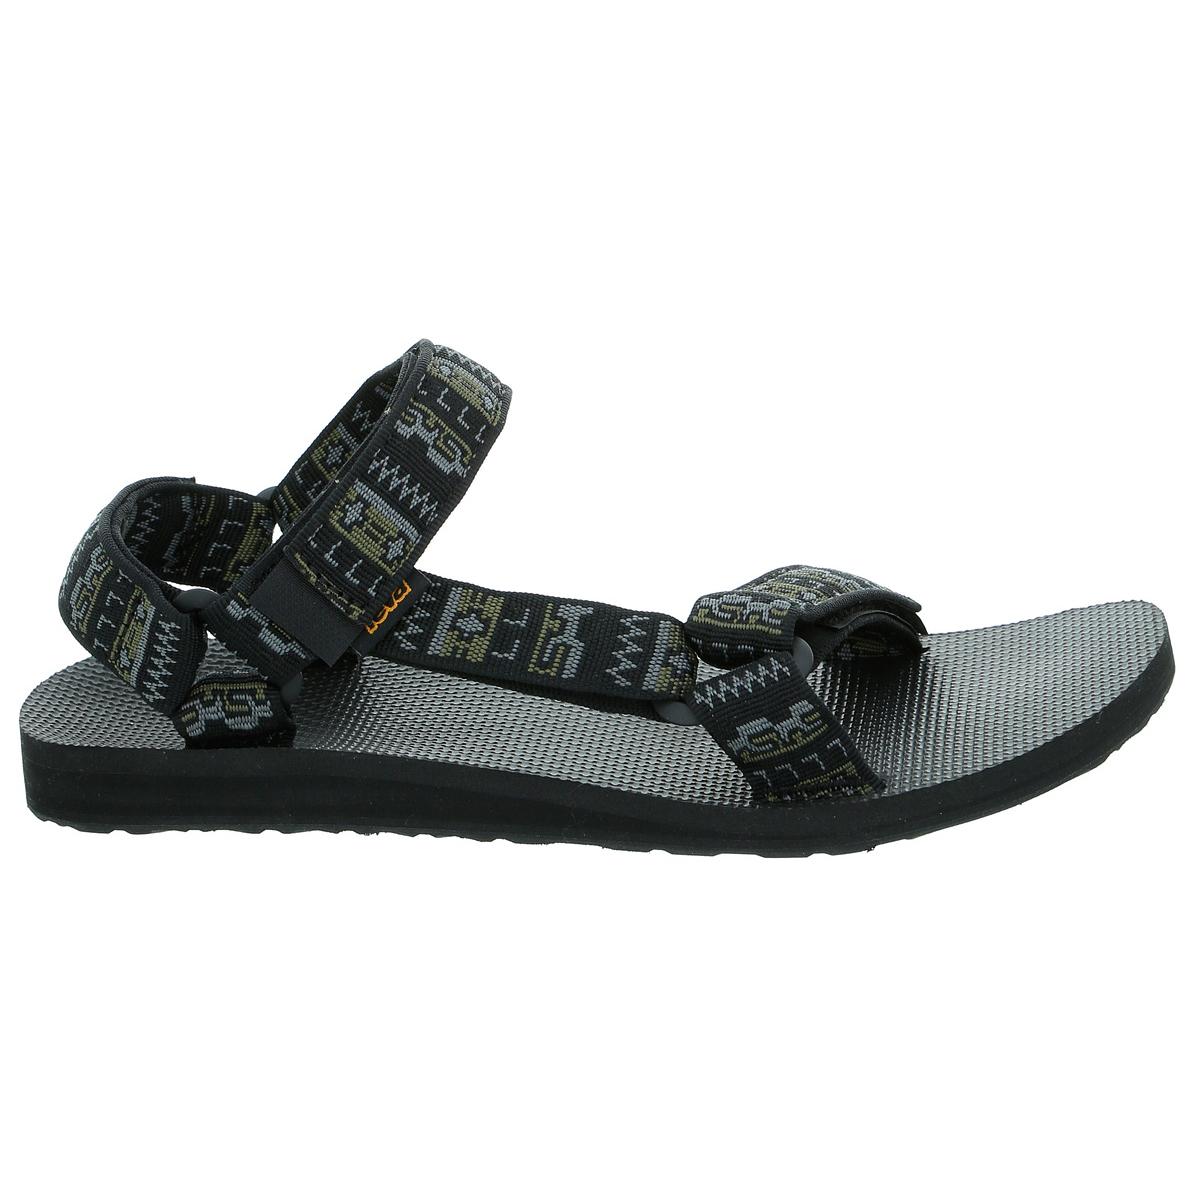 682d9982 Teva - Original Universal - Sandals - Boomerang Black / White   13 (US)